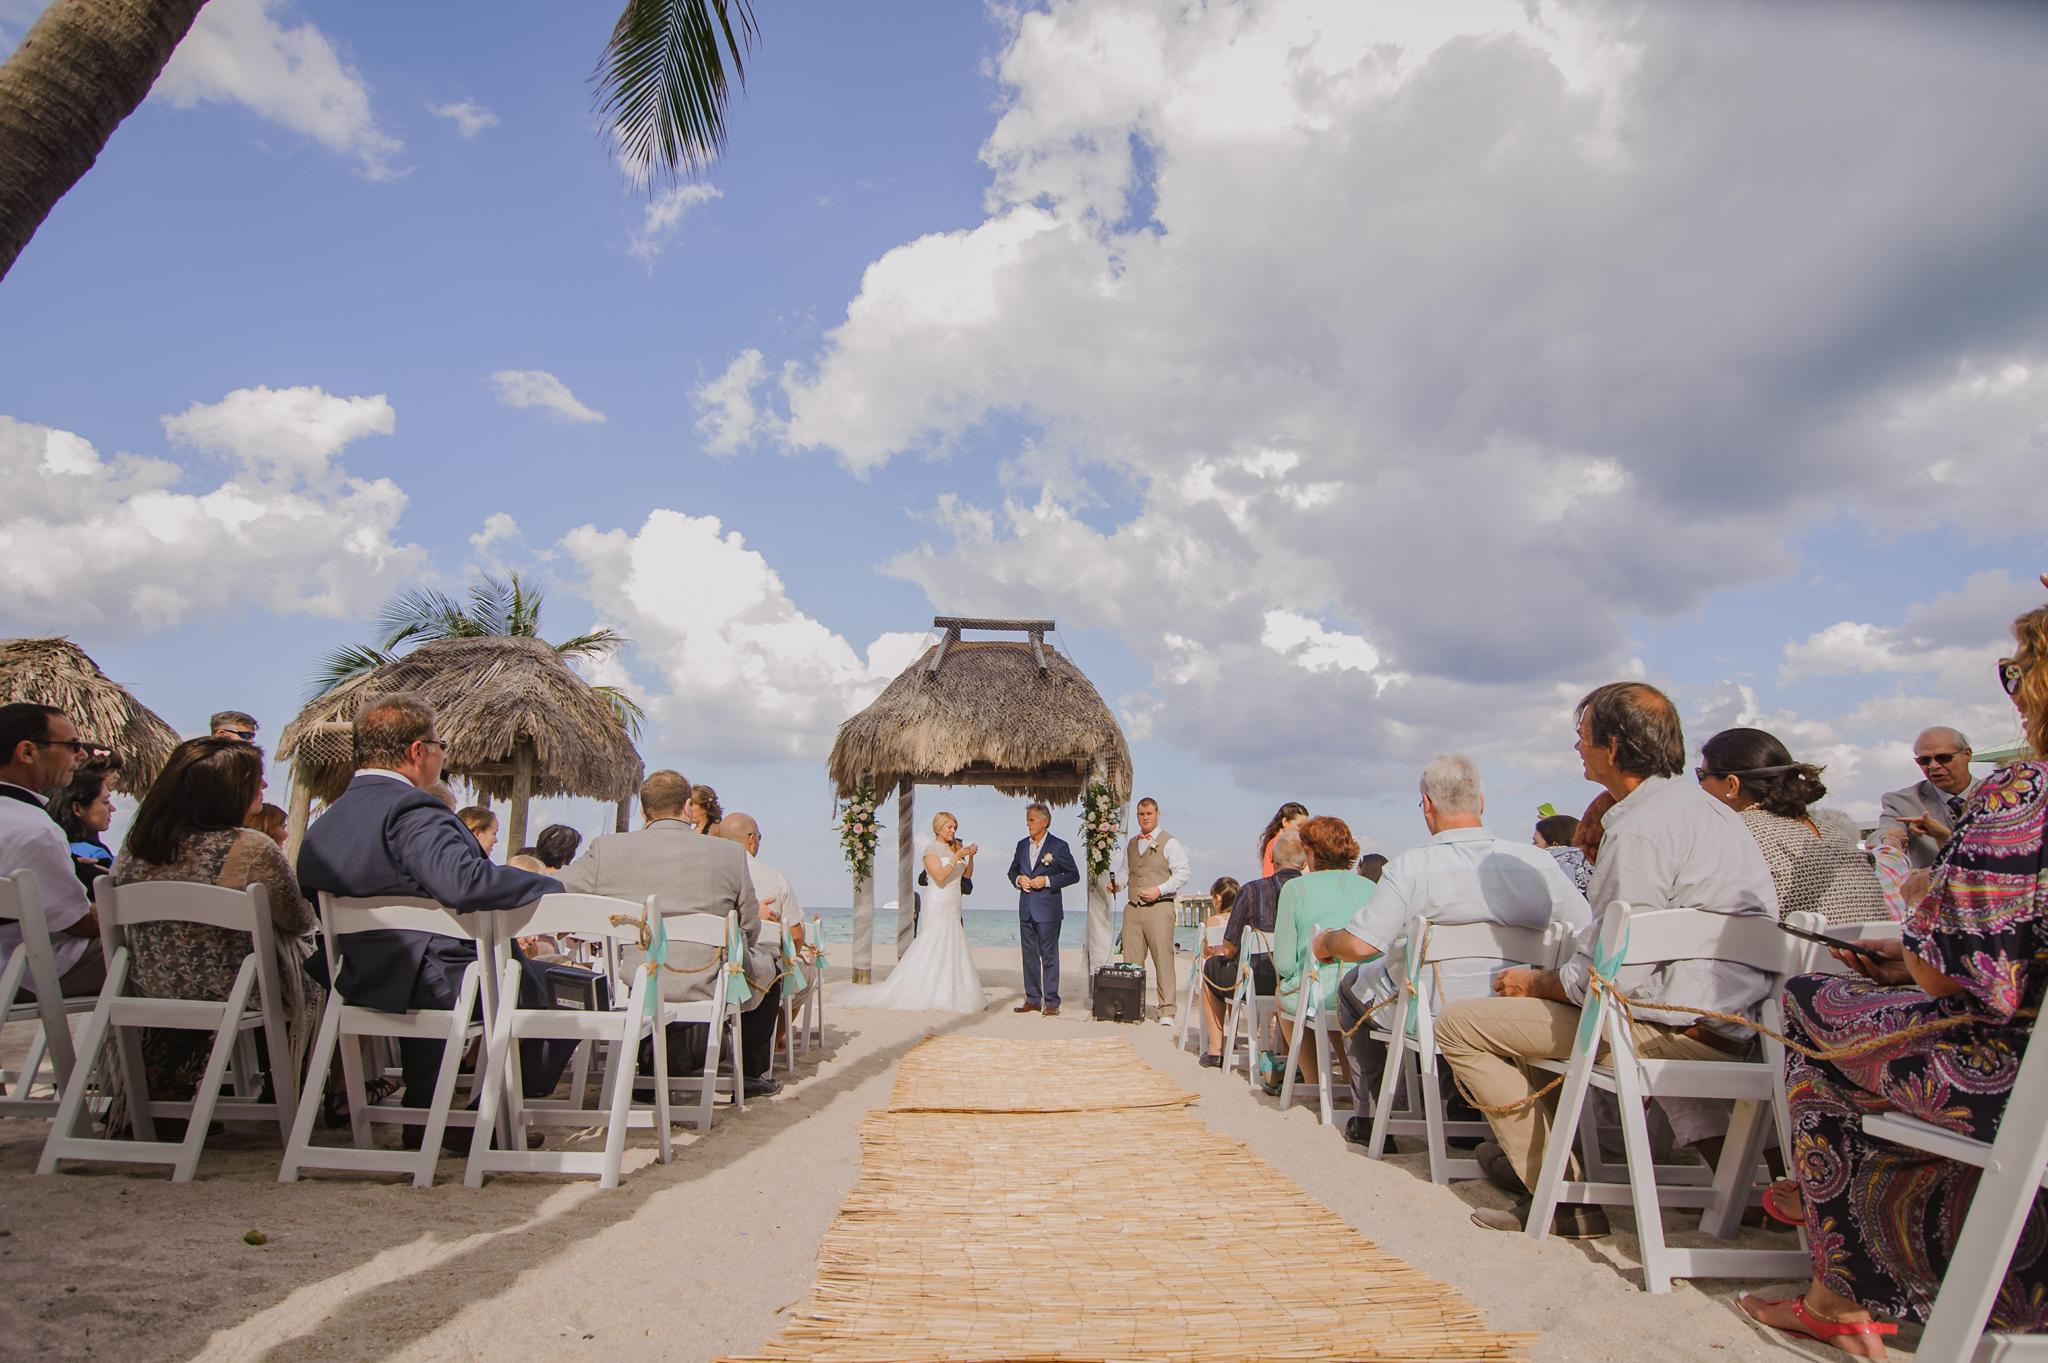 KELLY + ROBERT DESTINATION BEACH WEDDING:  NEWPORT BEACHSIDE RESORT, SUNNY ISLES, FL